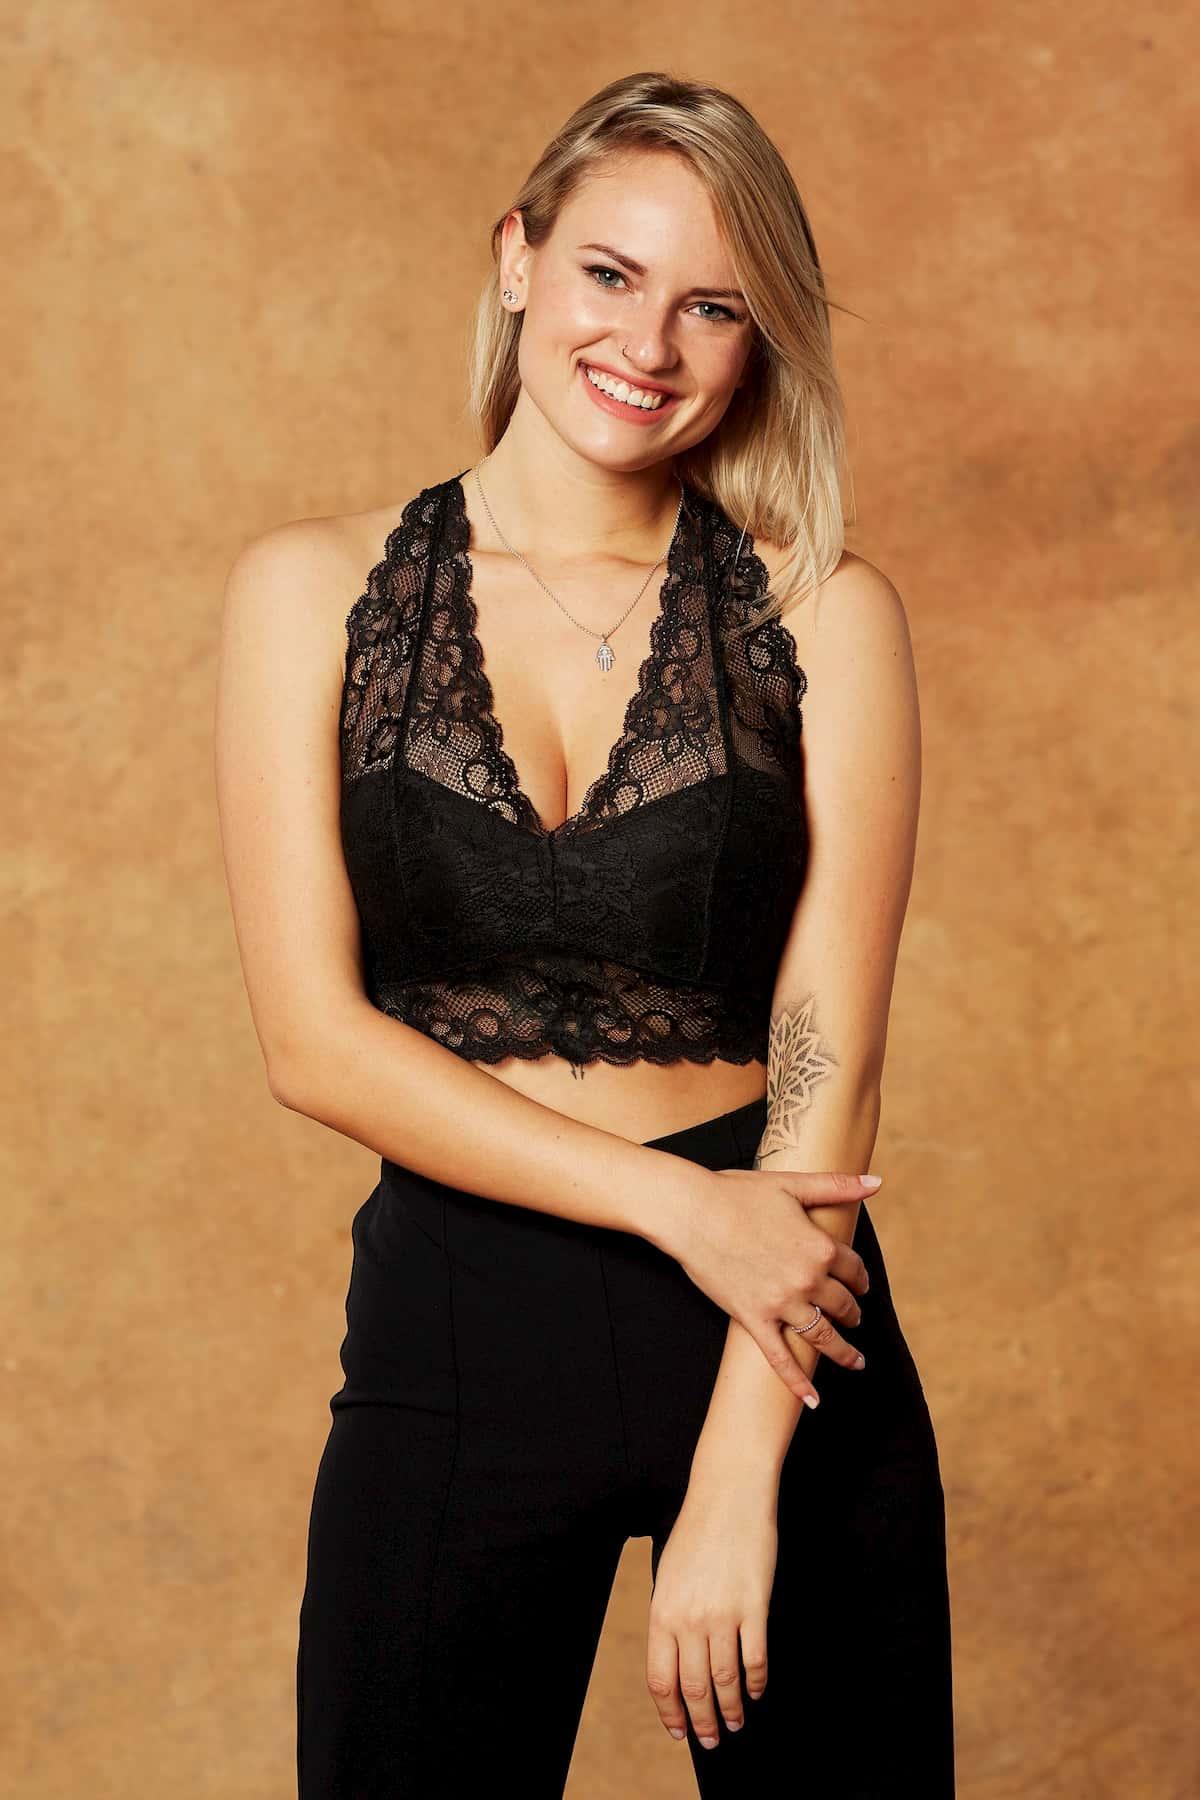 Kim-Denise als Kandidatin beim Bachelor 2021